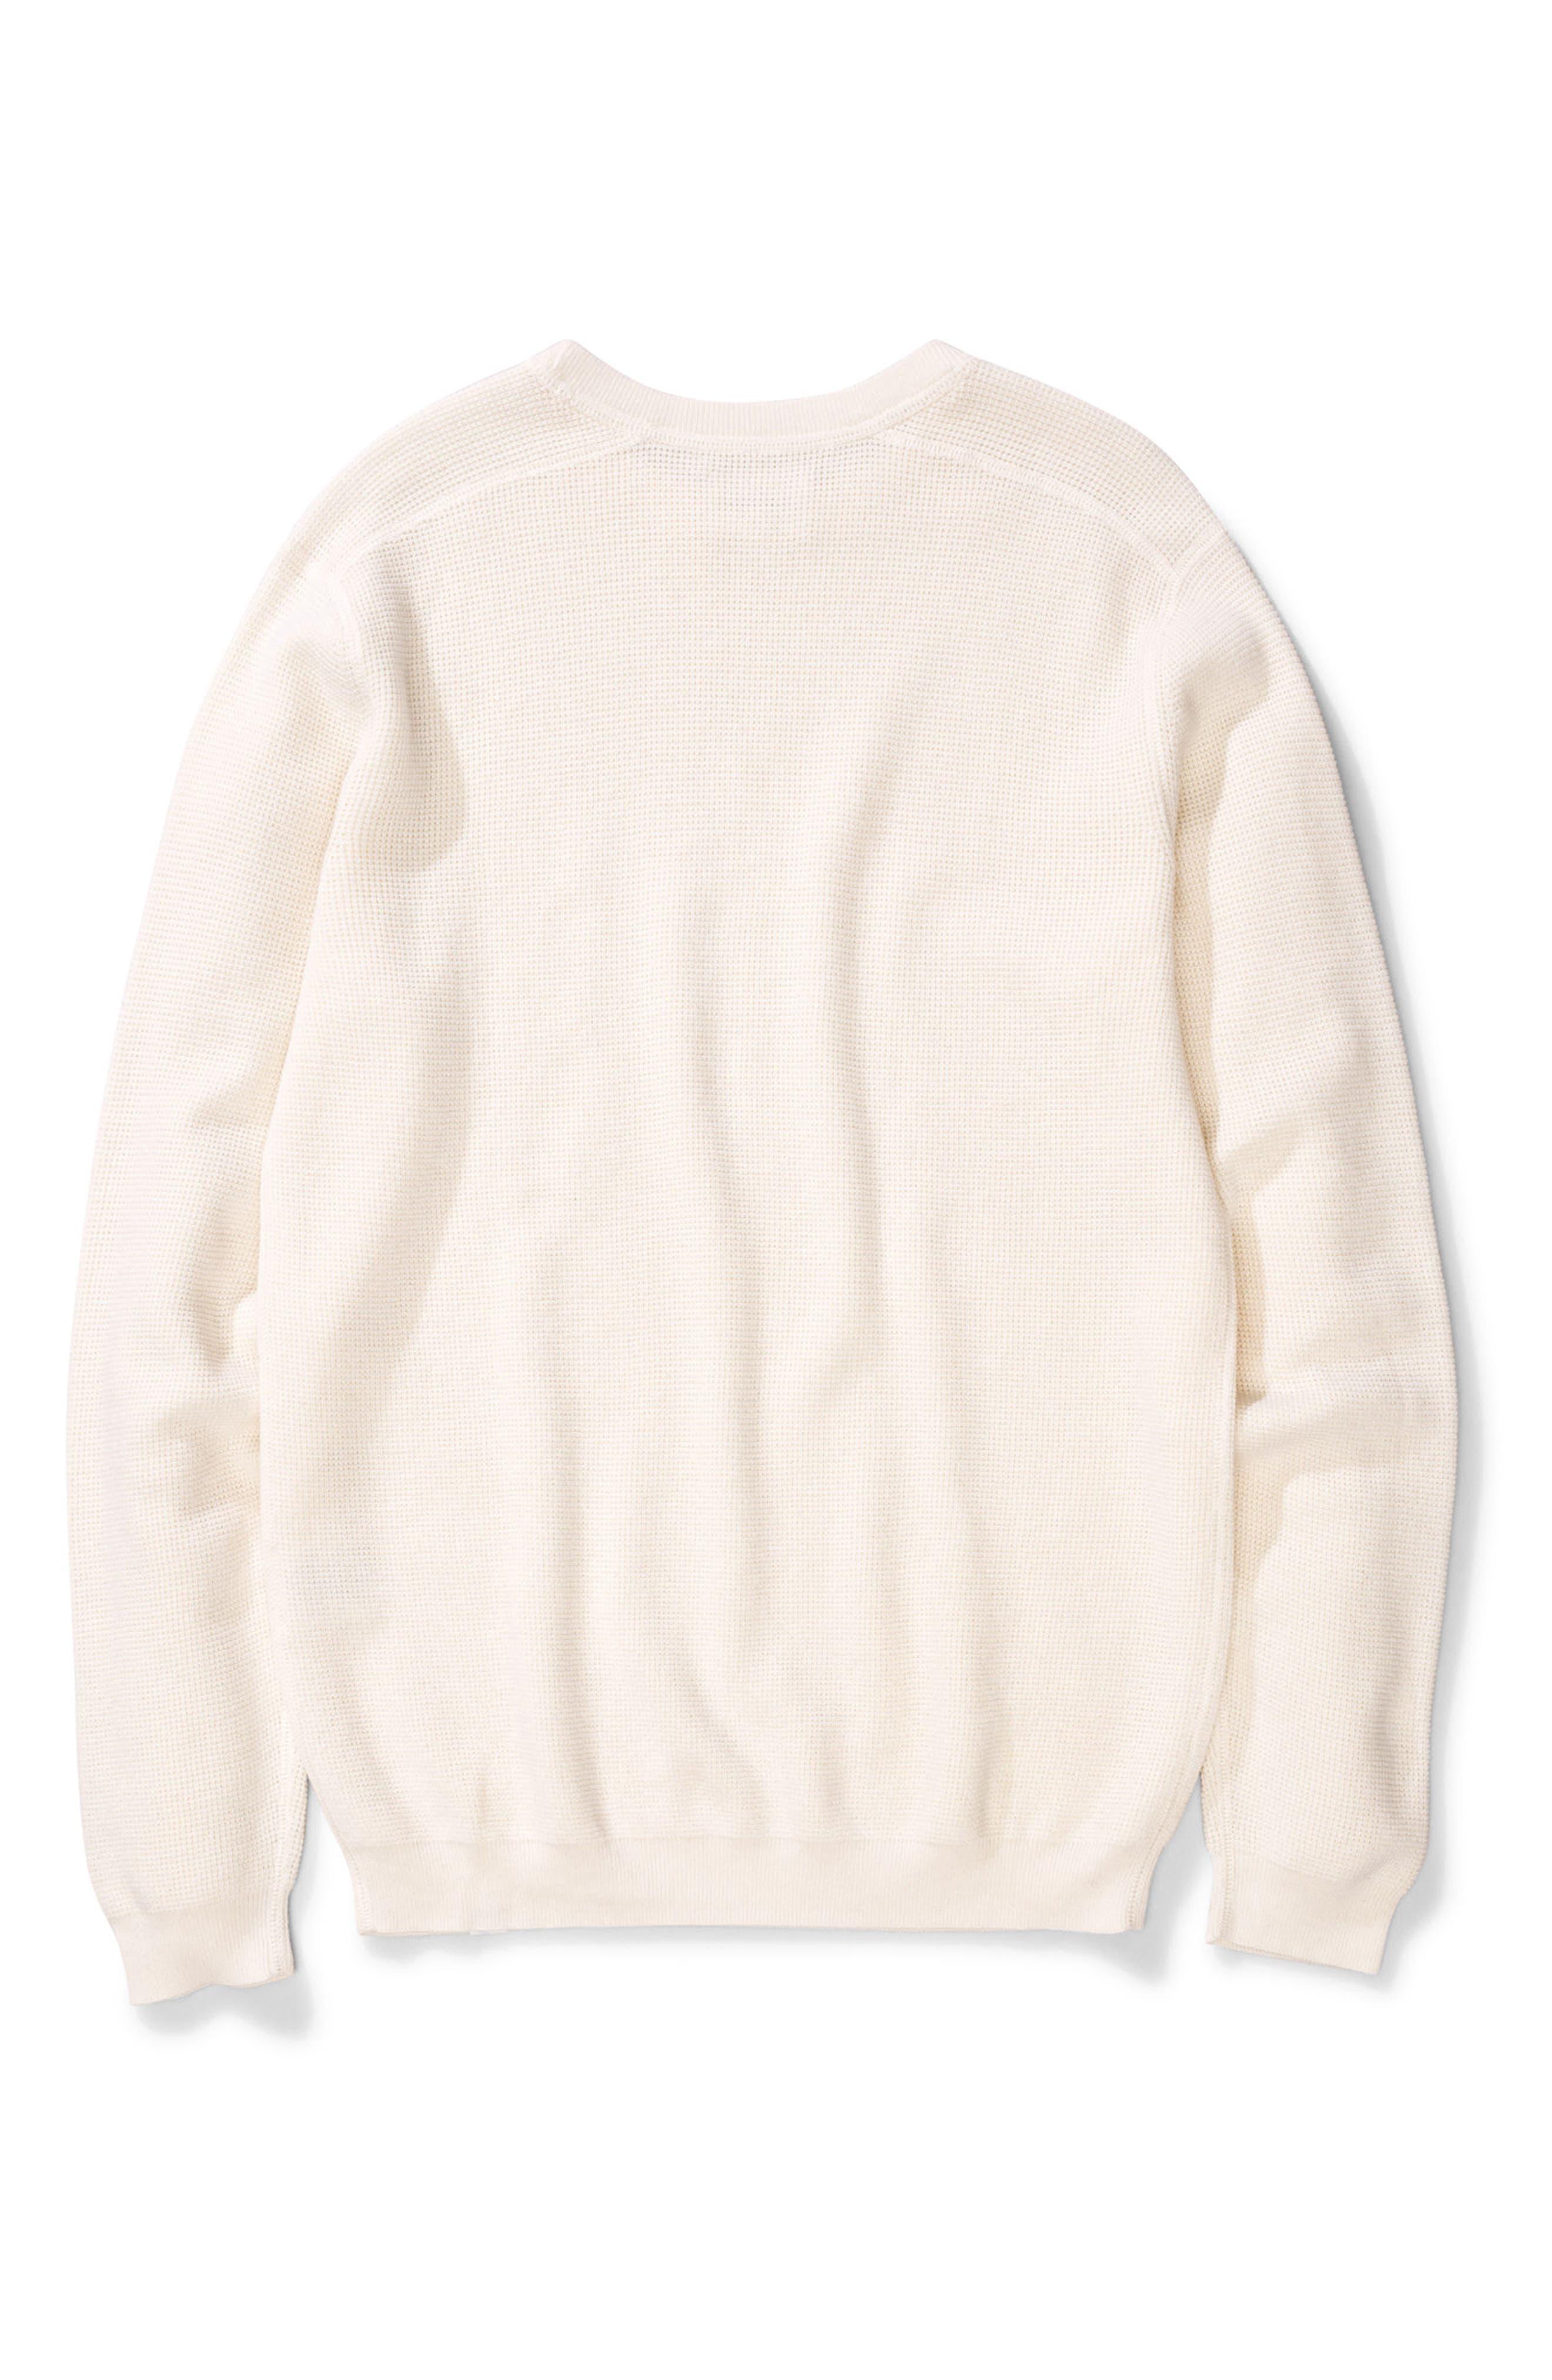 Lauge Waffle Knit Sweatshirt,                             Main thumbnail 1, color,                             101